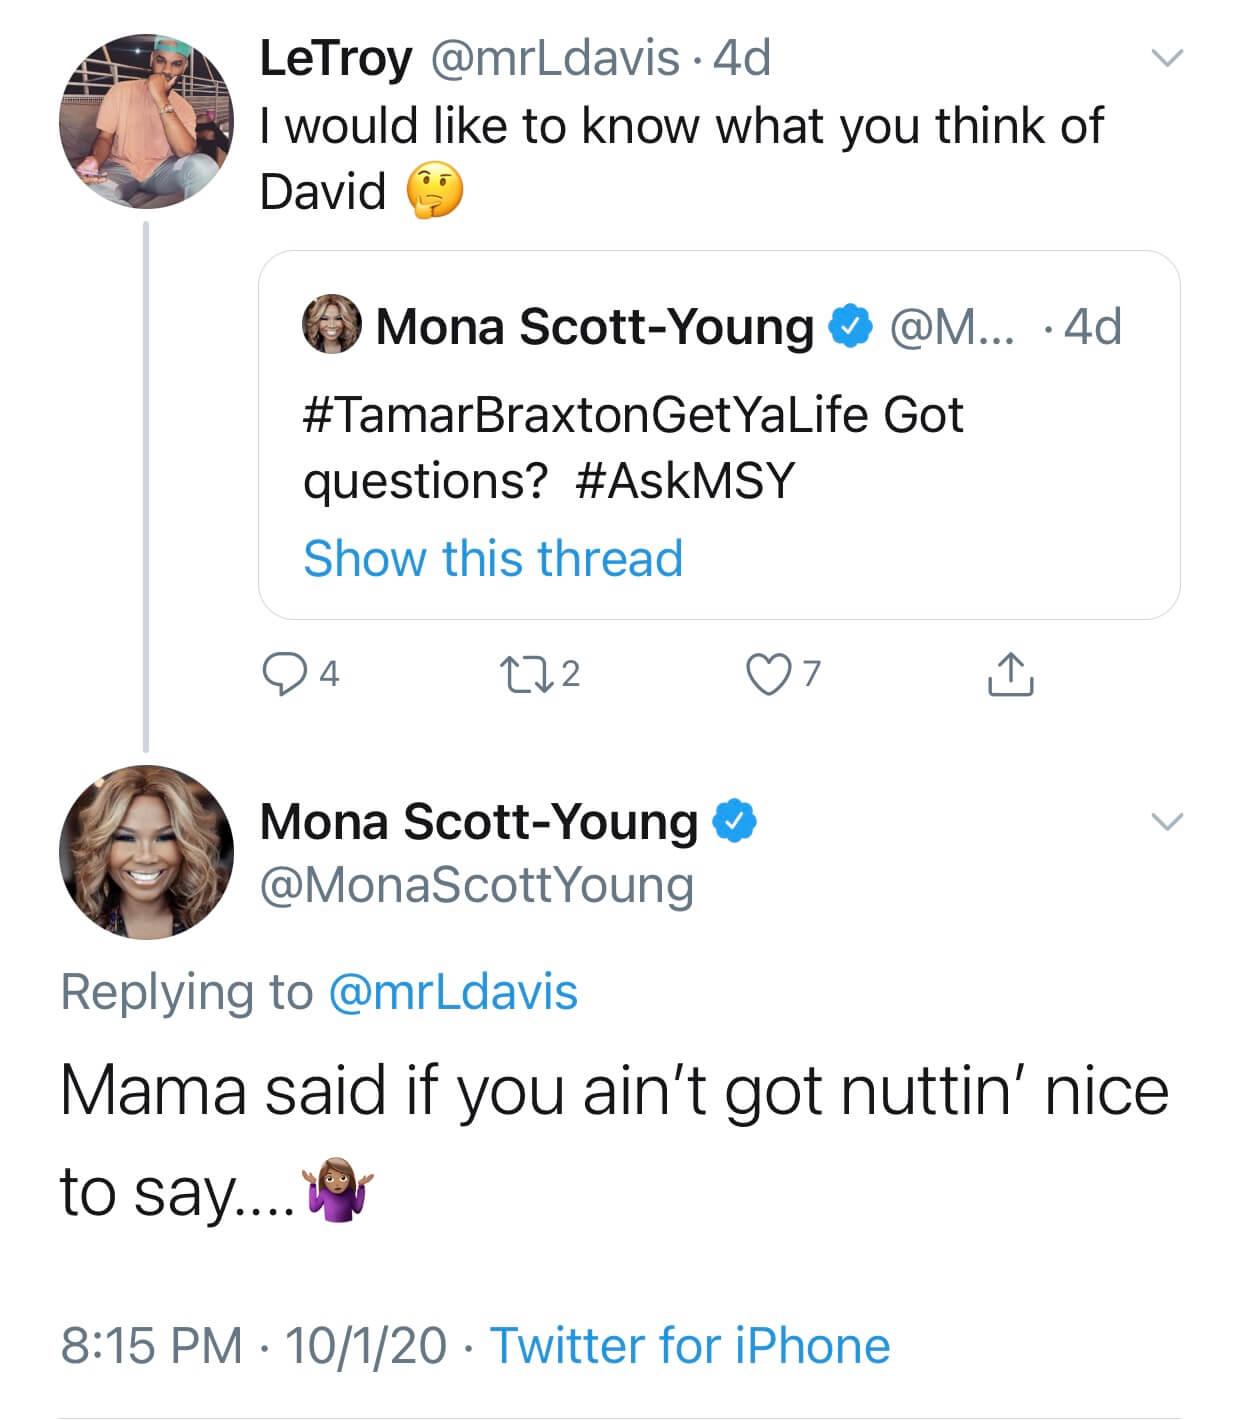 Mona Scott-Young